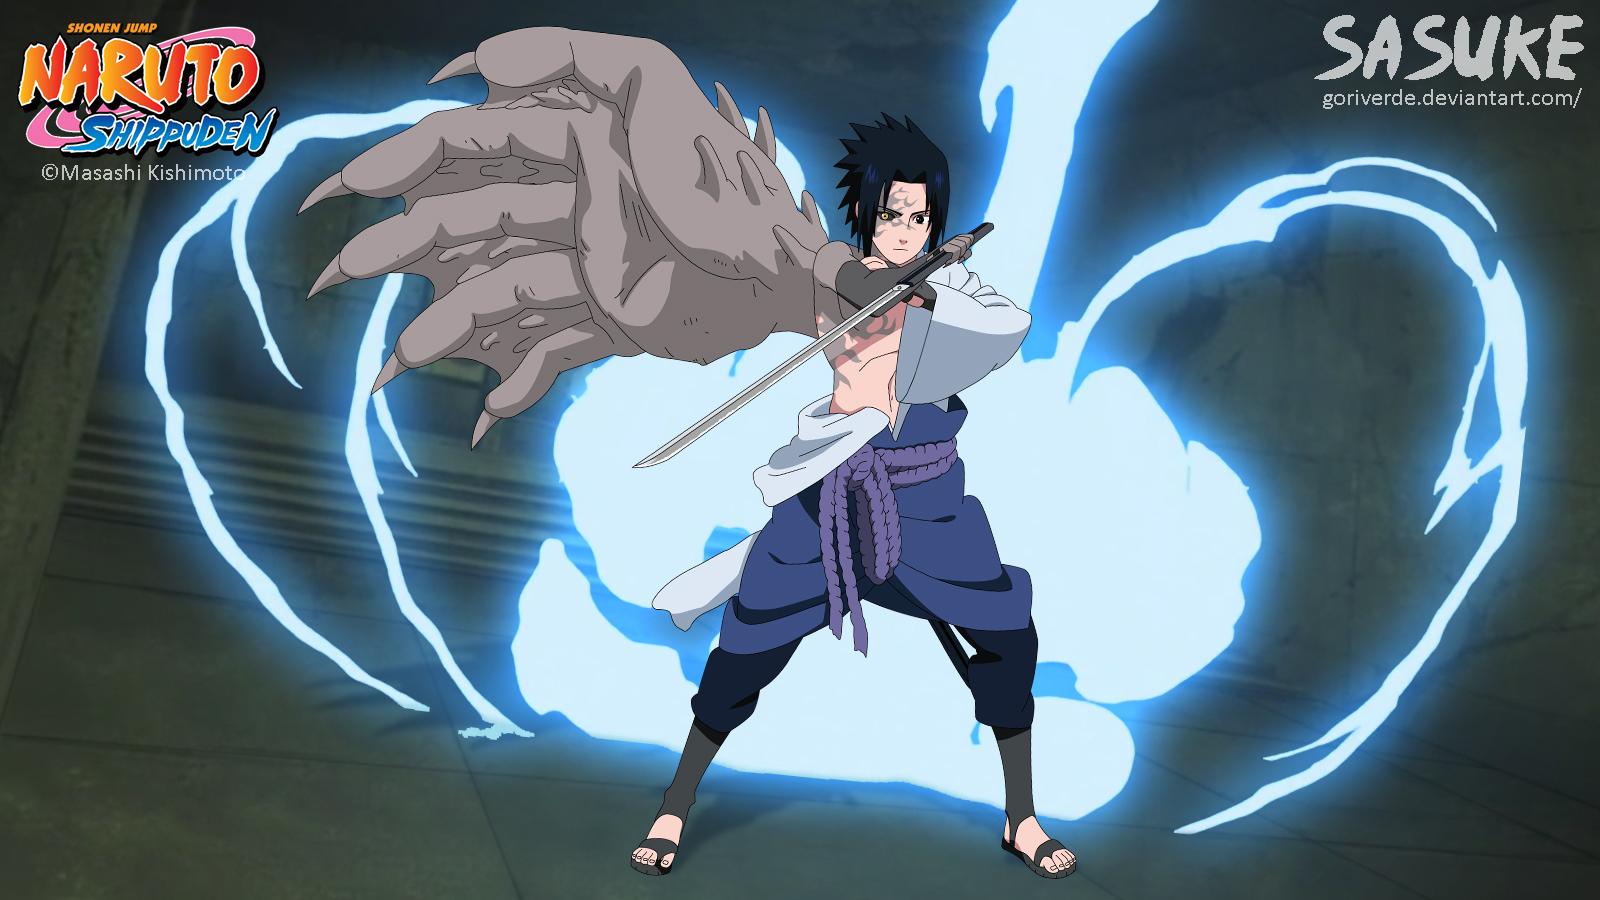 Lucu Naruto Dan Sasuke Bergerak Dp Bbm Lucu